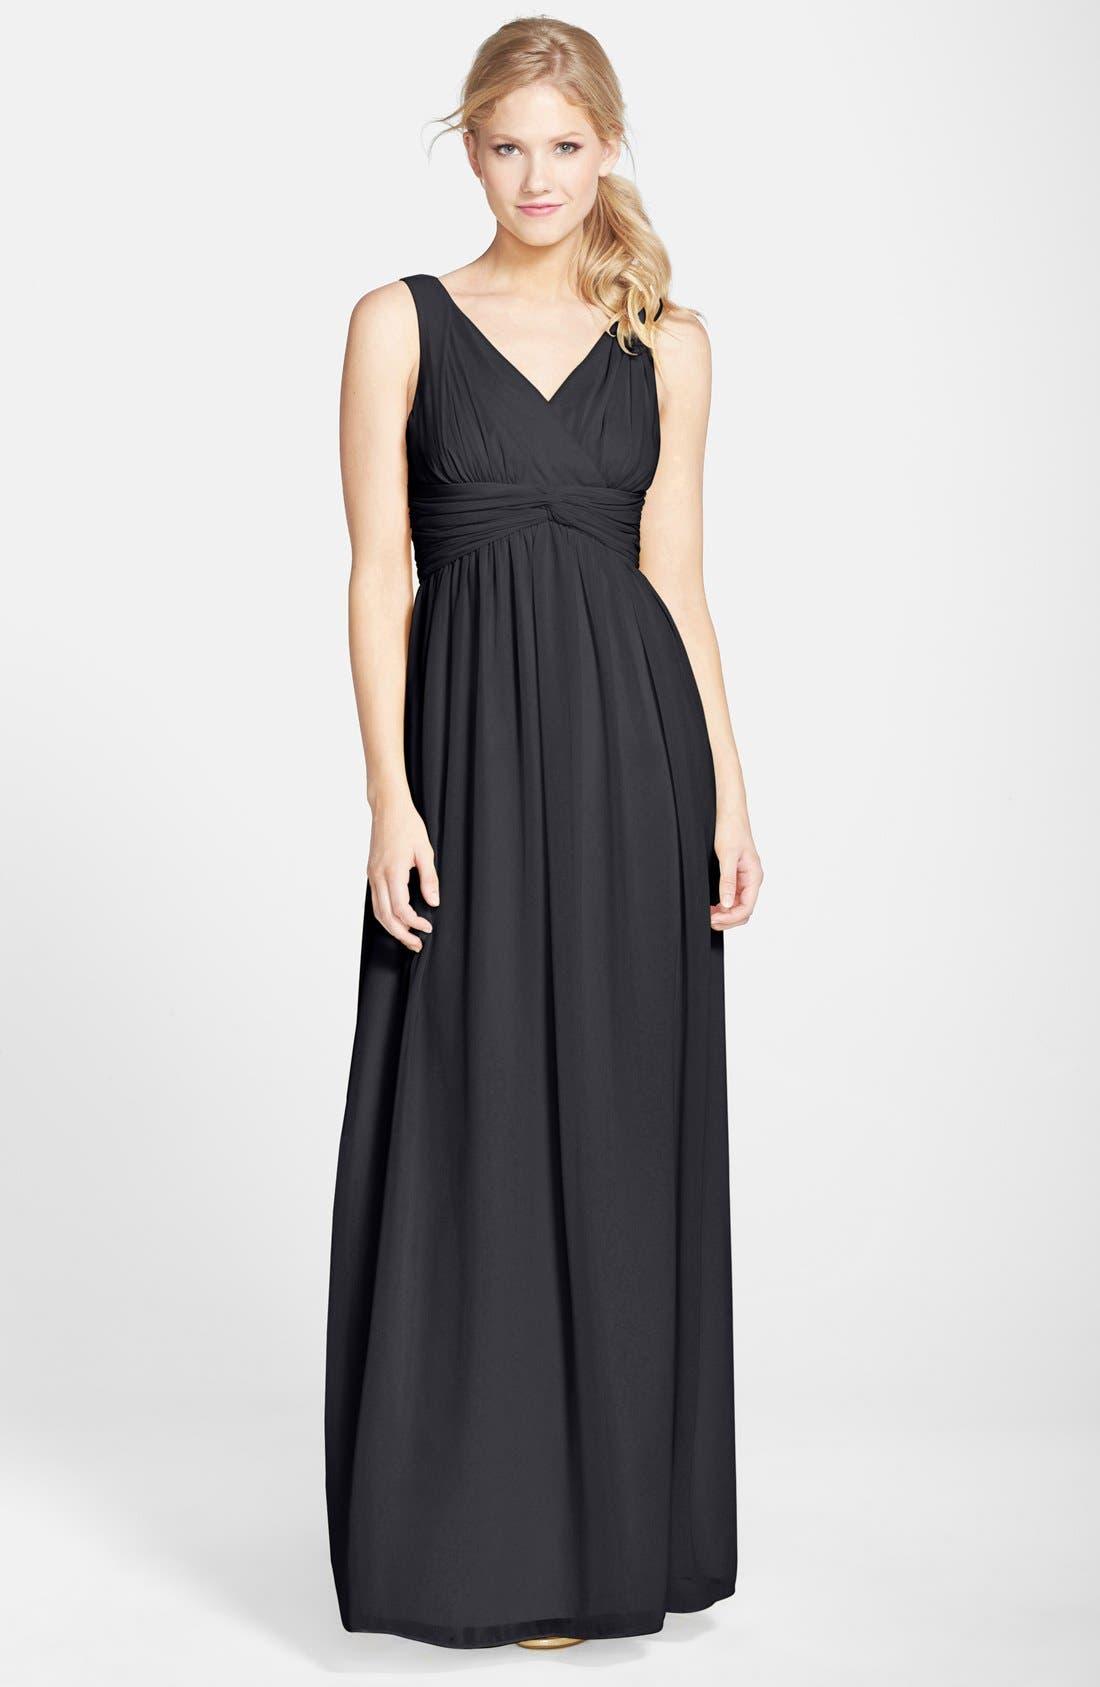 DONNA MORGAN 'Julie' Twist-Waist Silk Chiffon Gown, Main, color, 001